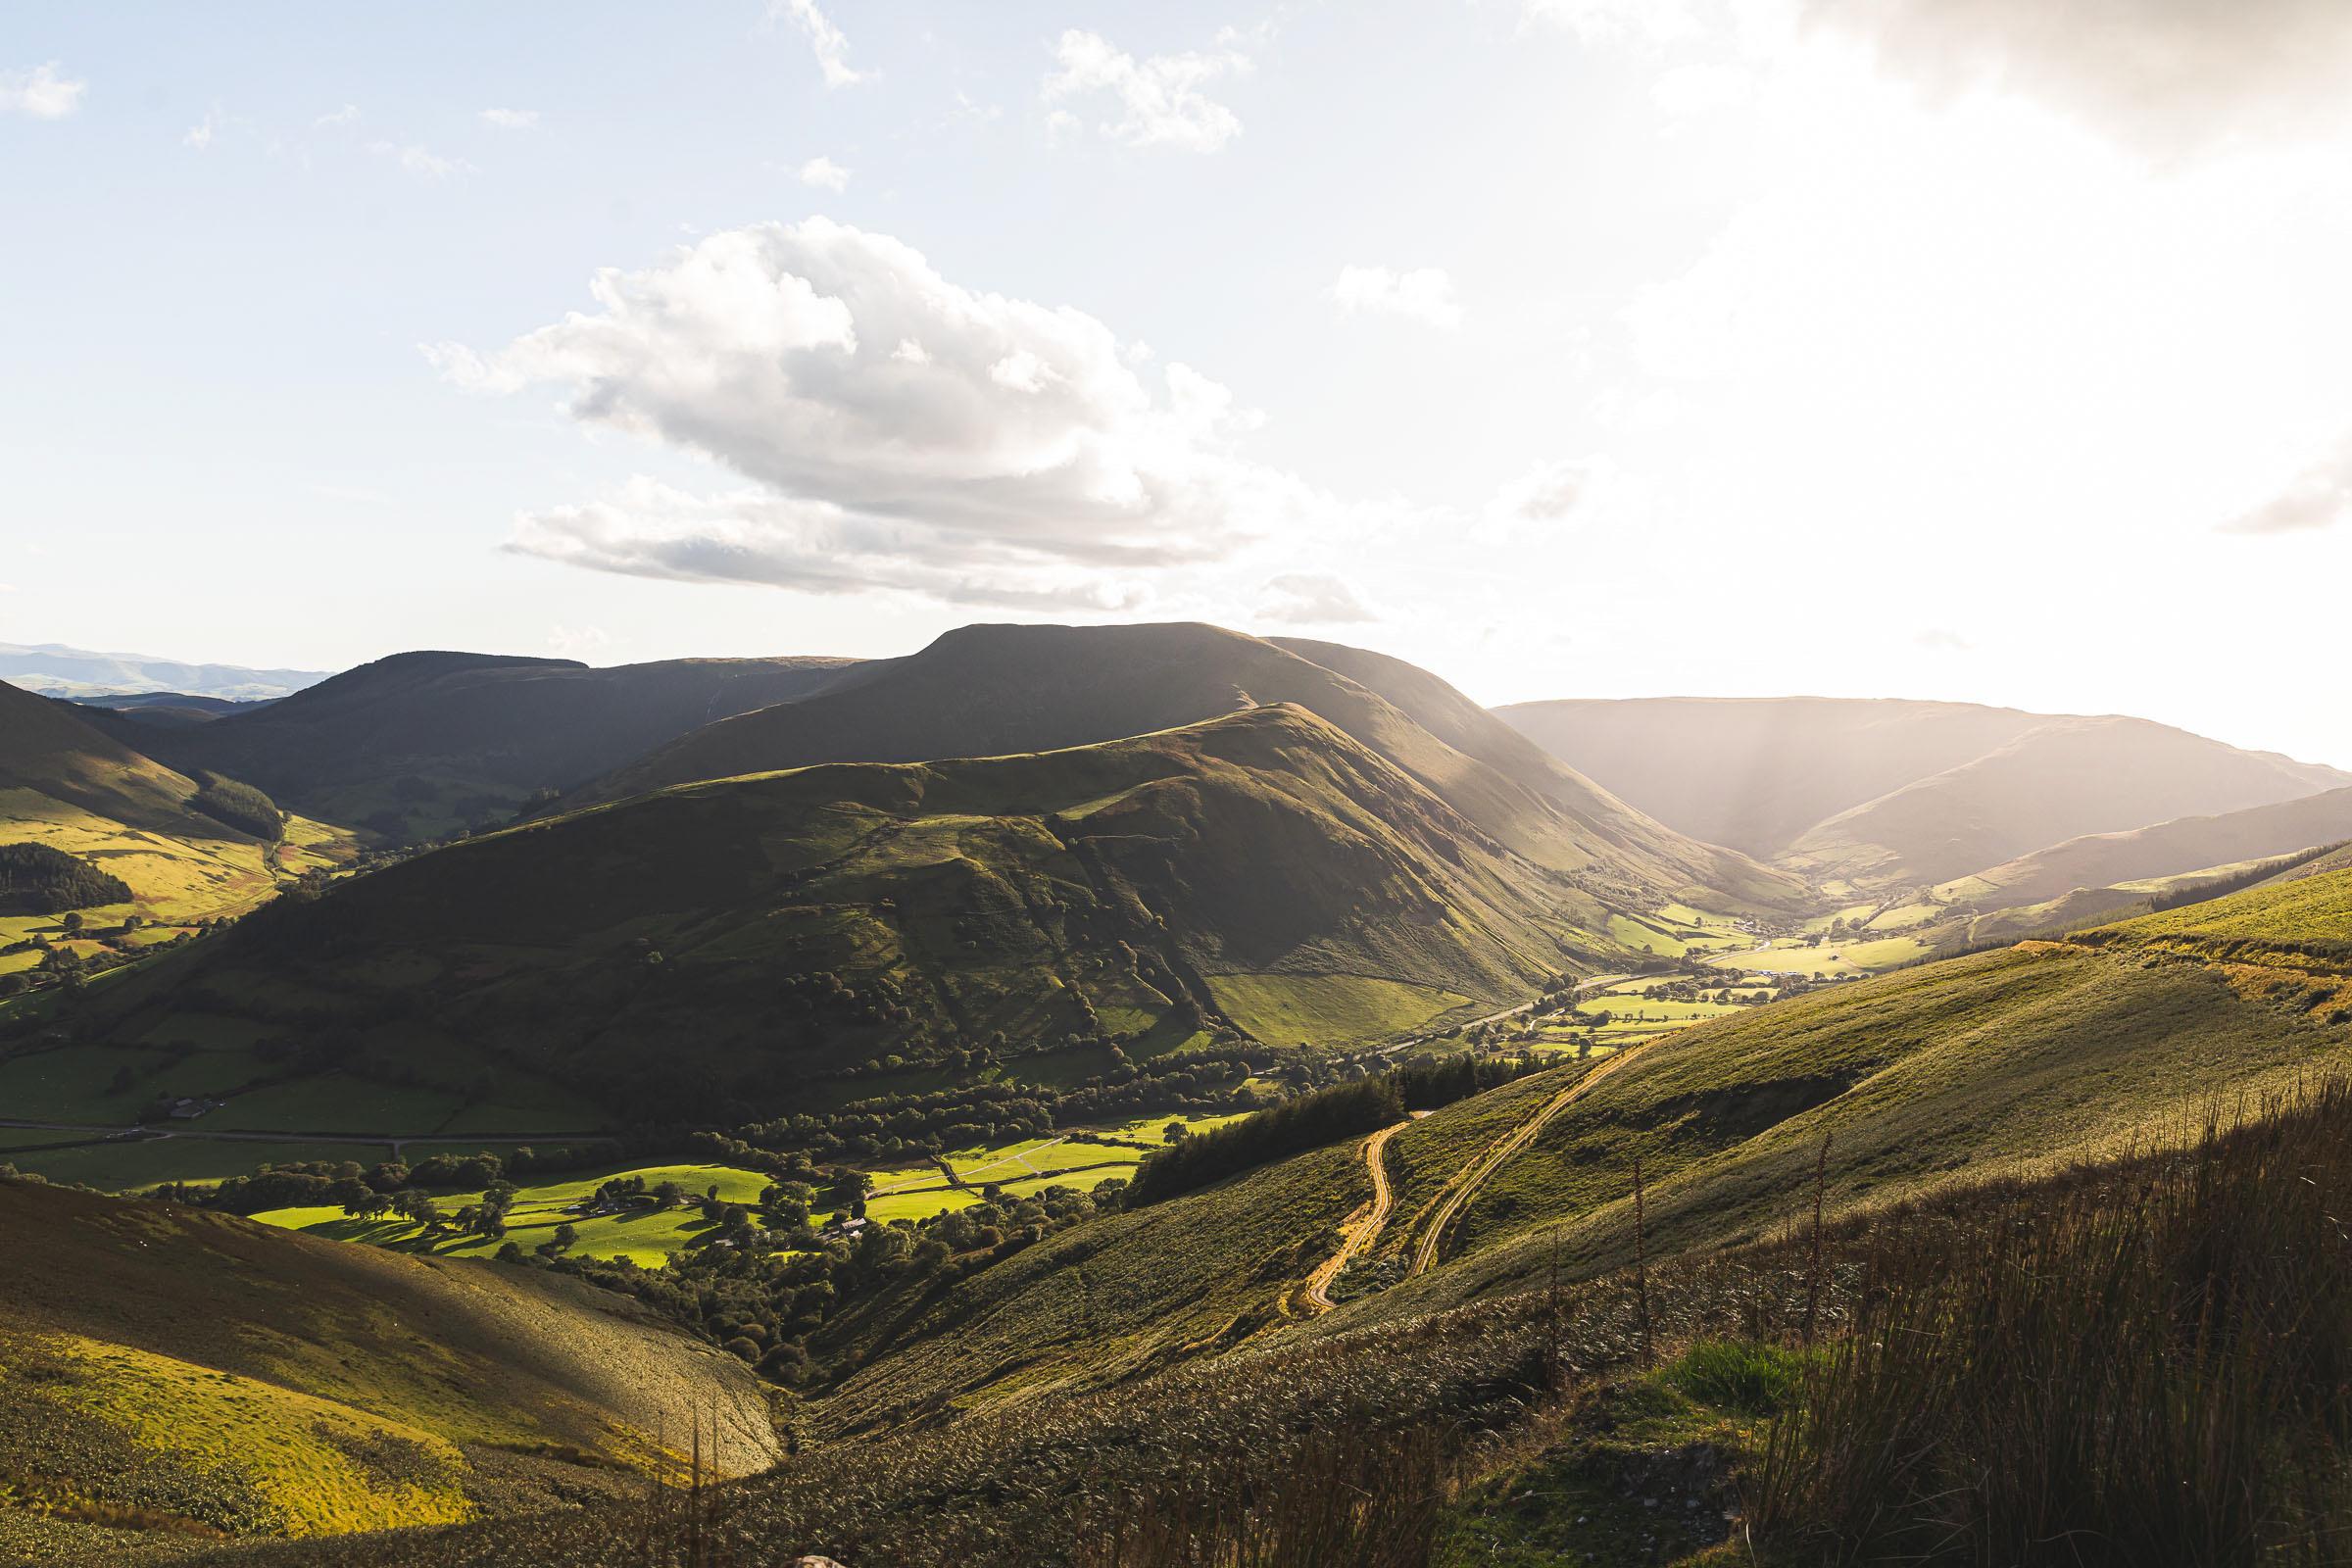 Travel - Dinas Mawddwy, Wales